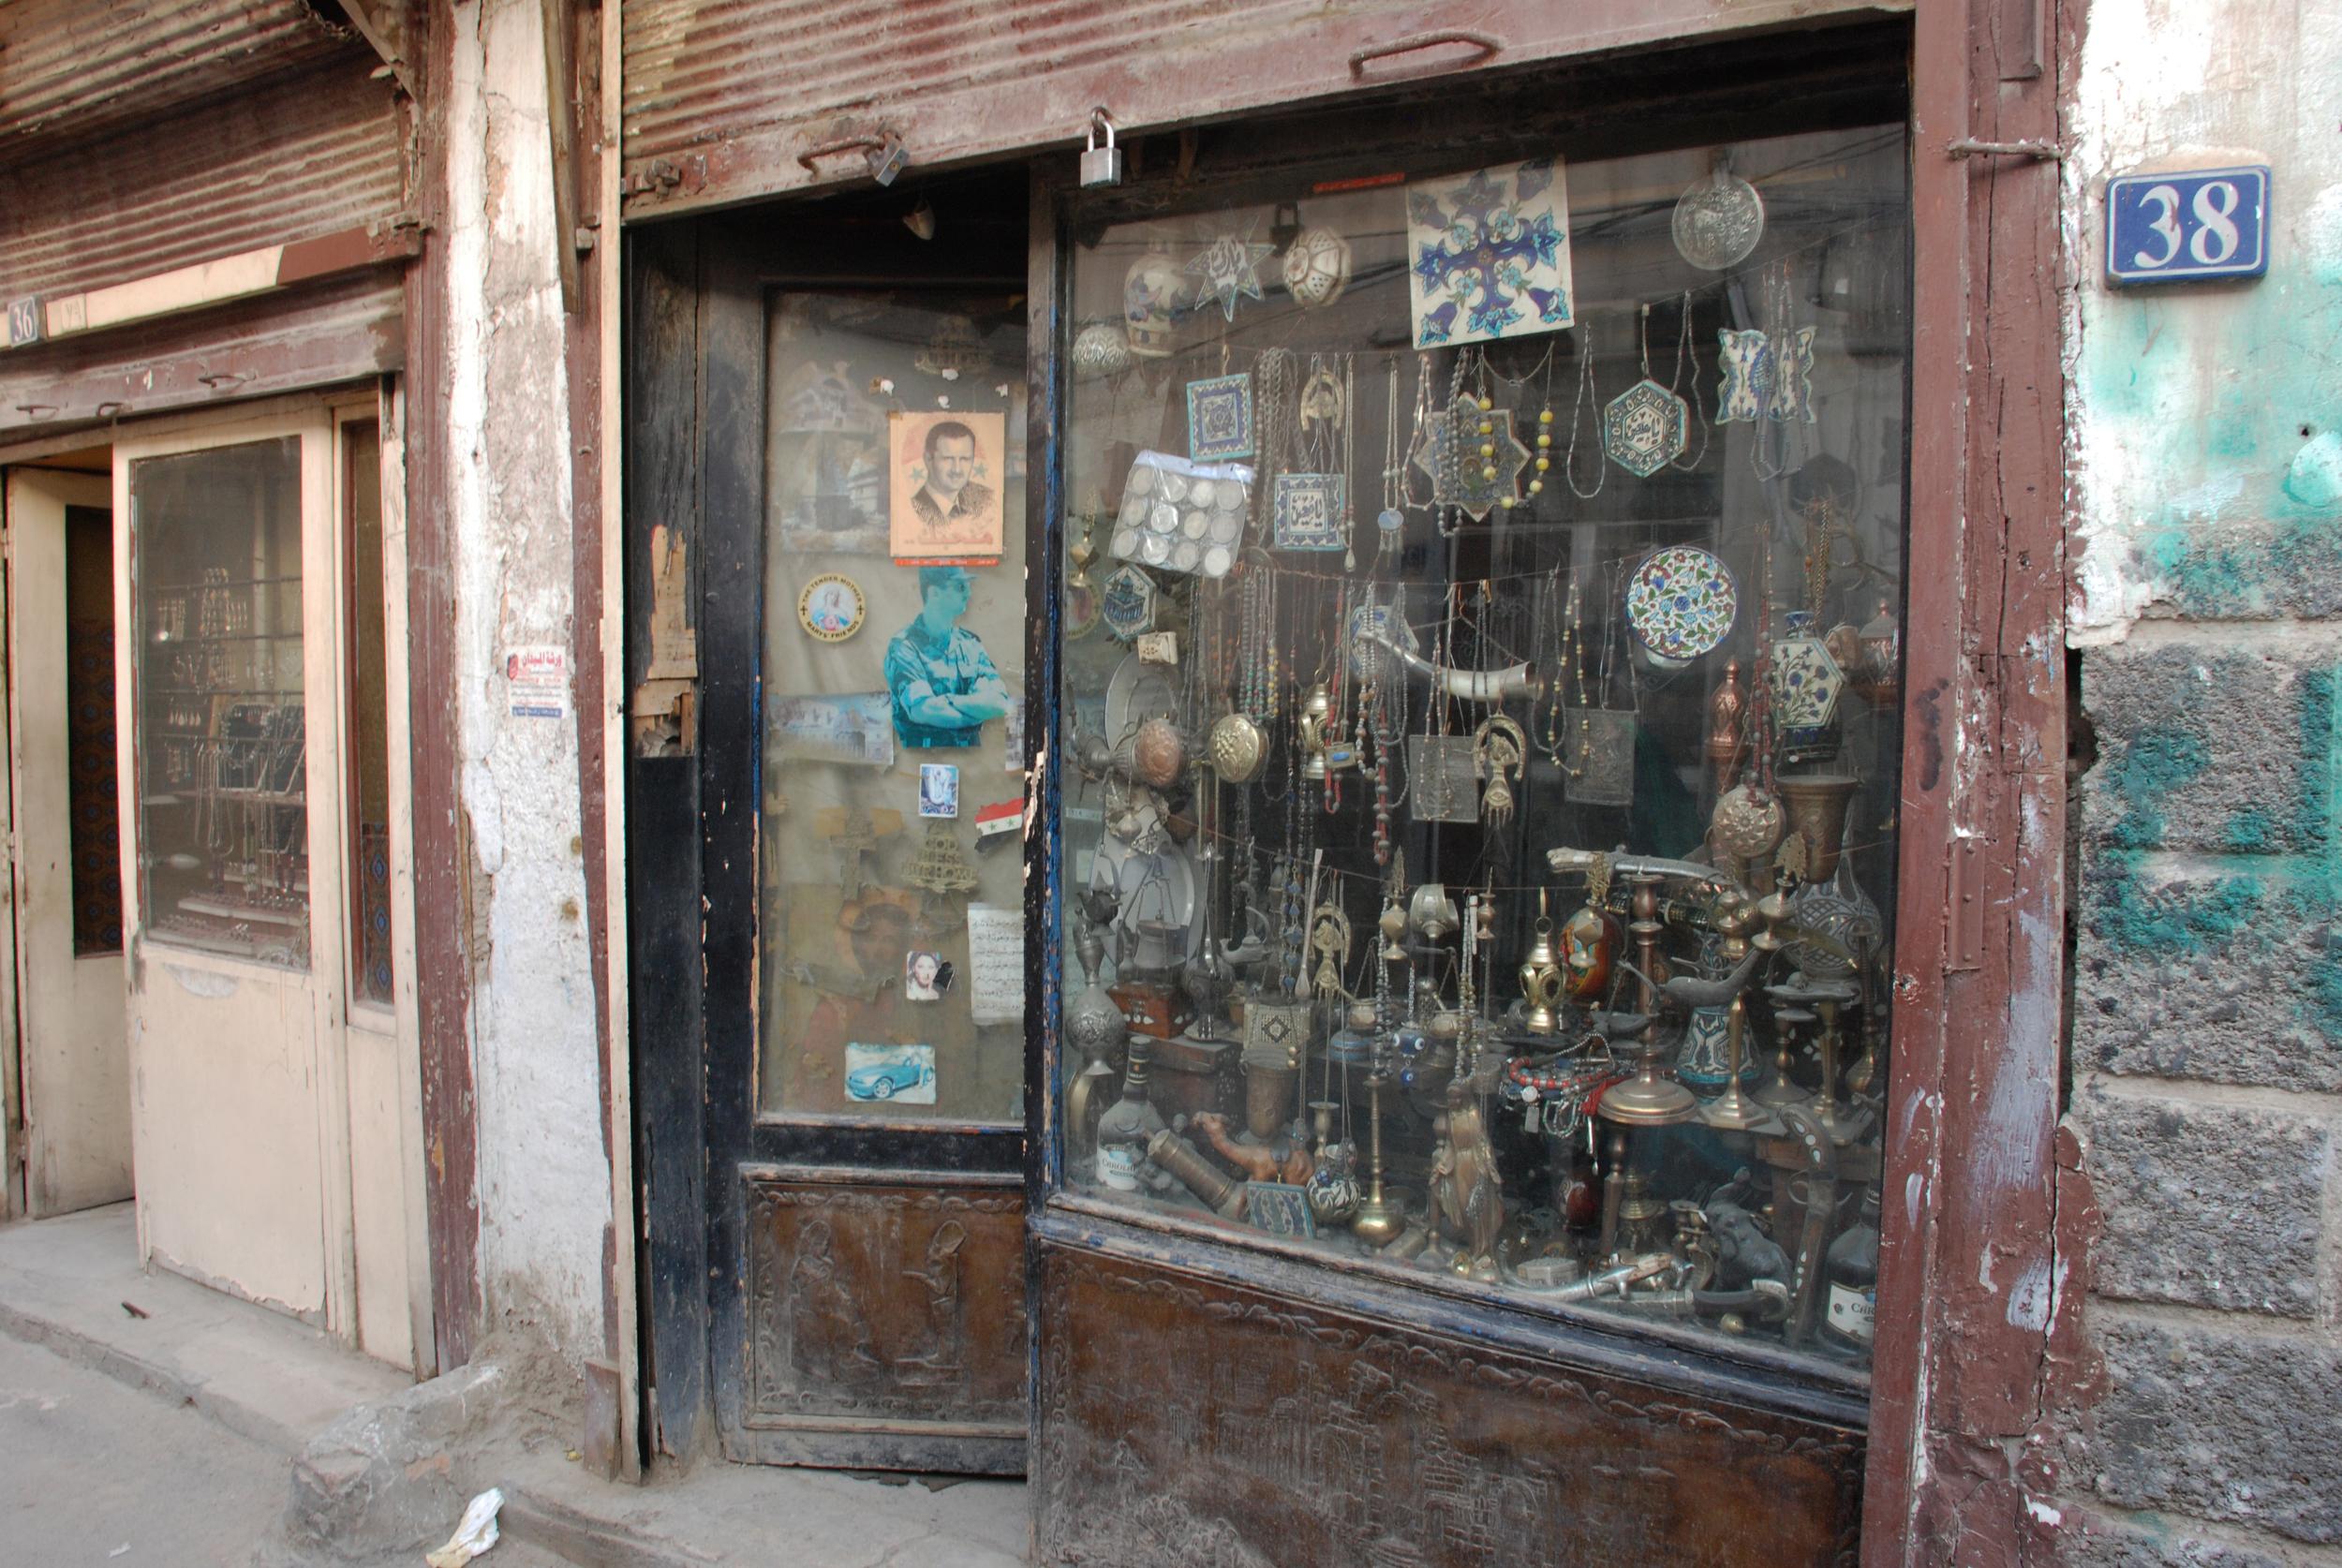 Storefront in Old Jewish Neighborhood- Damascus, Syria